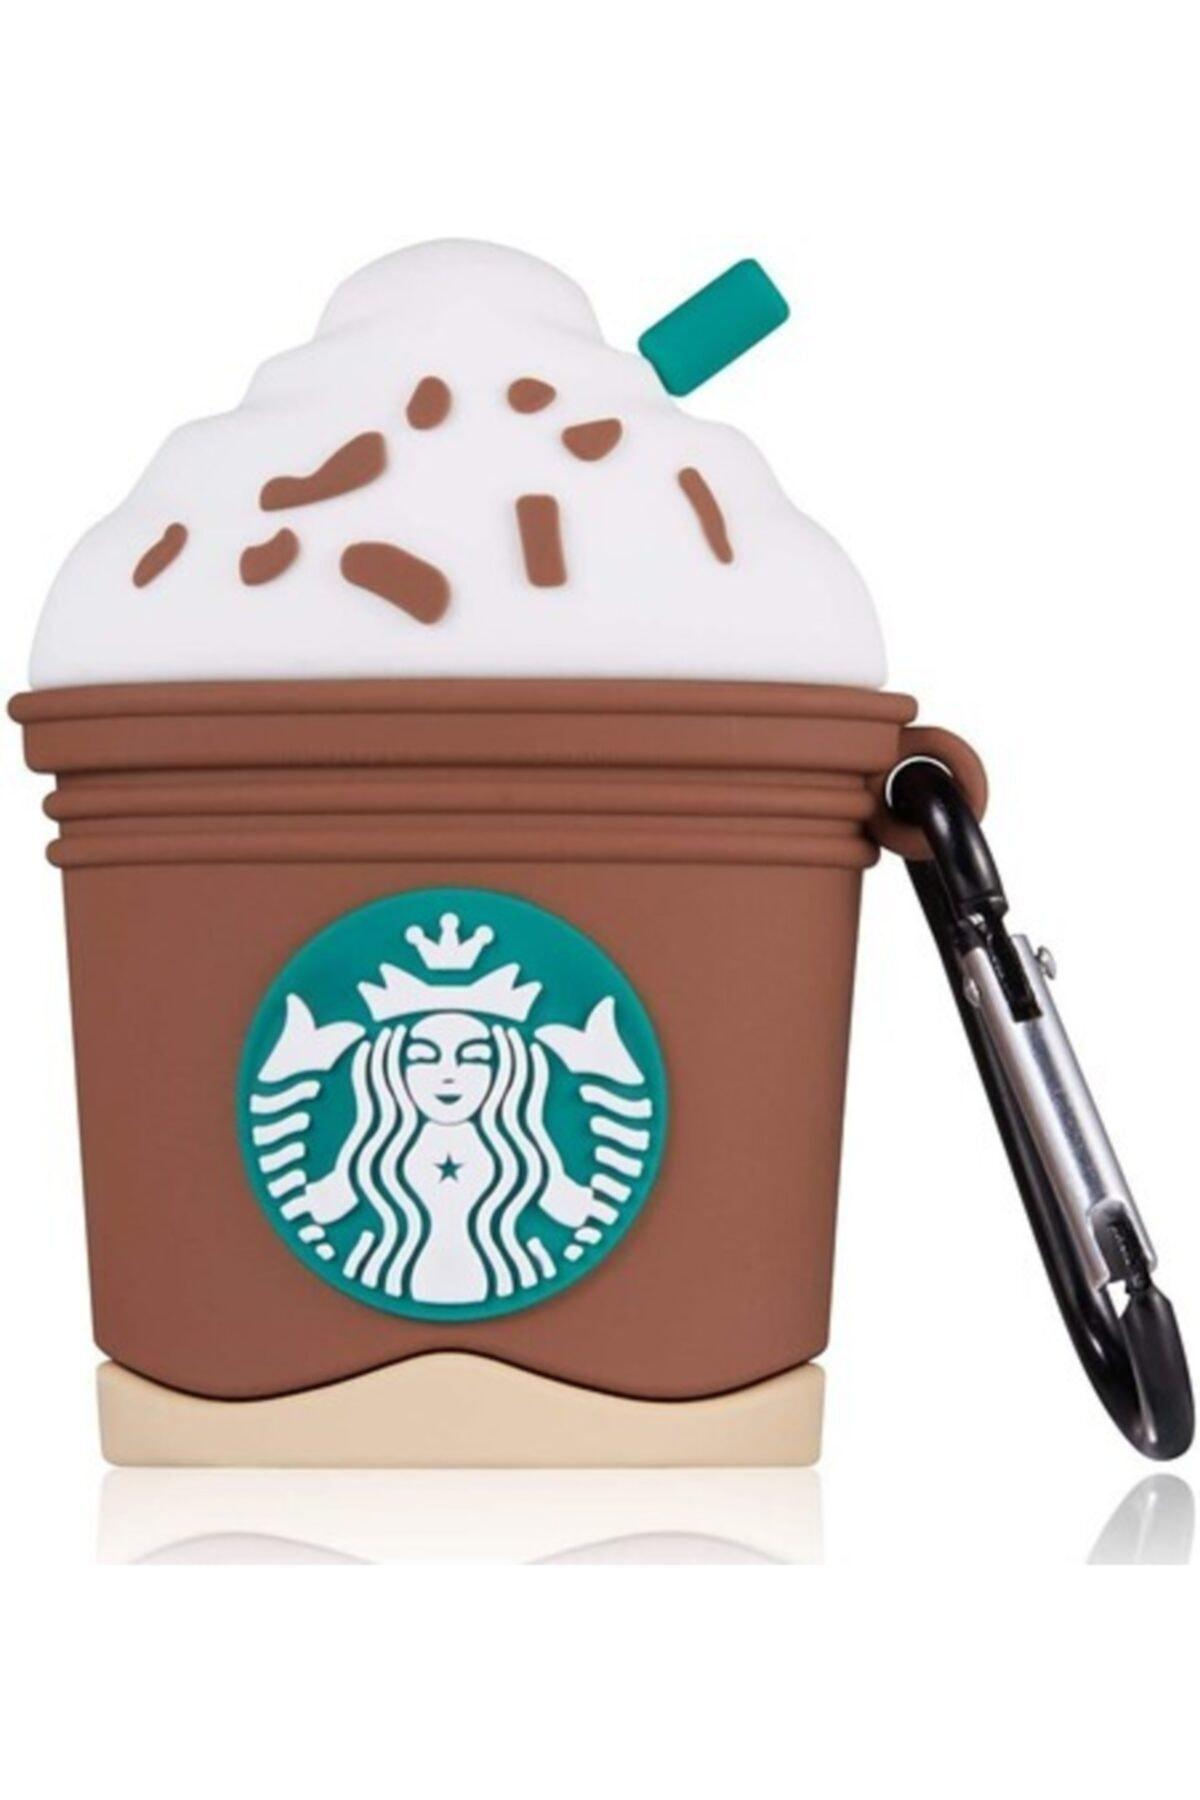 MY MÜRDÜM Sevimli Starbucks Kahverengi Airpods Kılıfı 1. Ve 2. Nesil Uyumlu 1